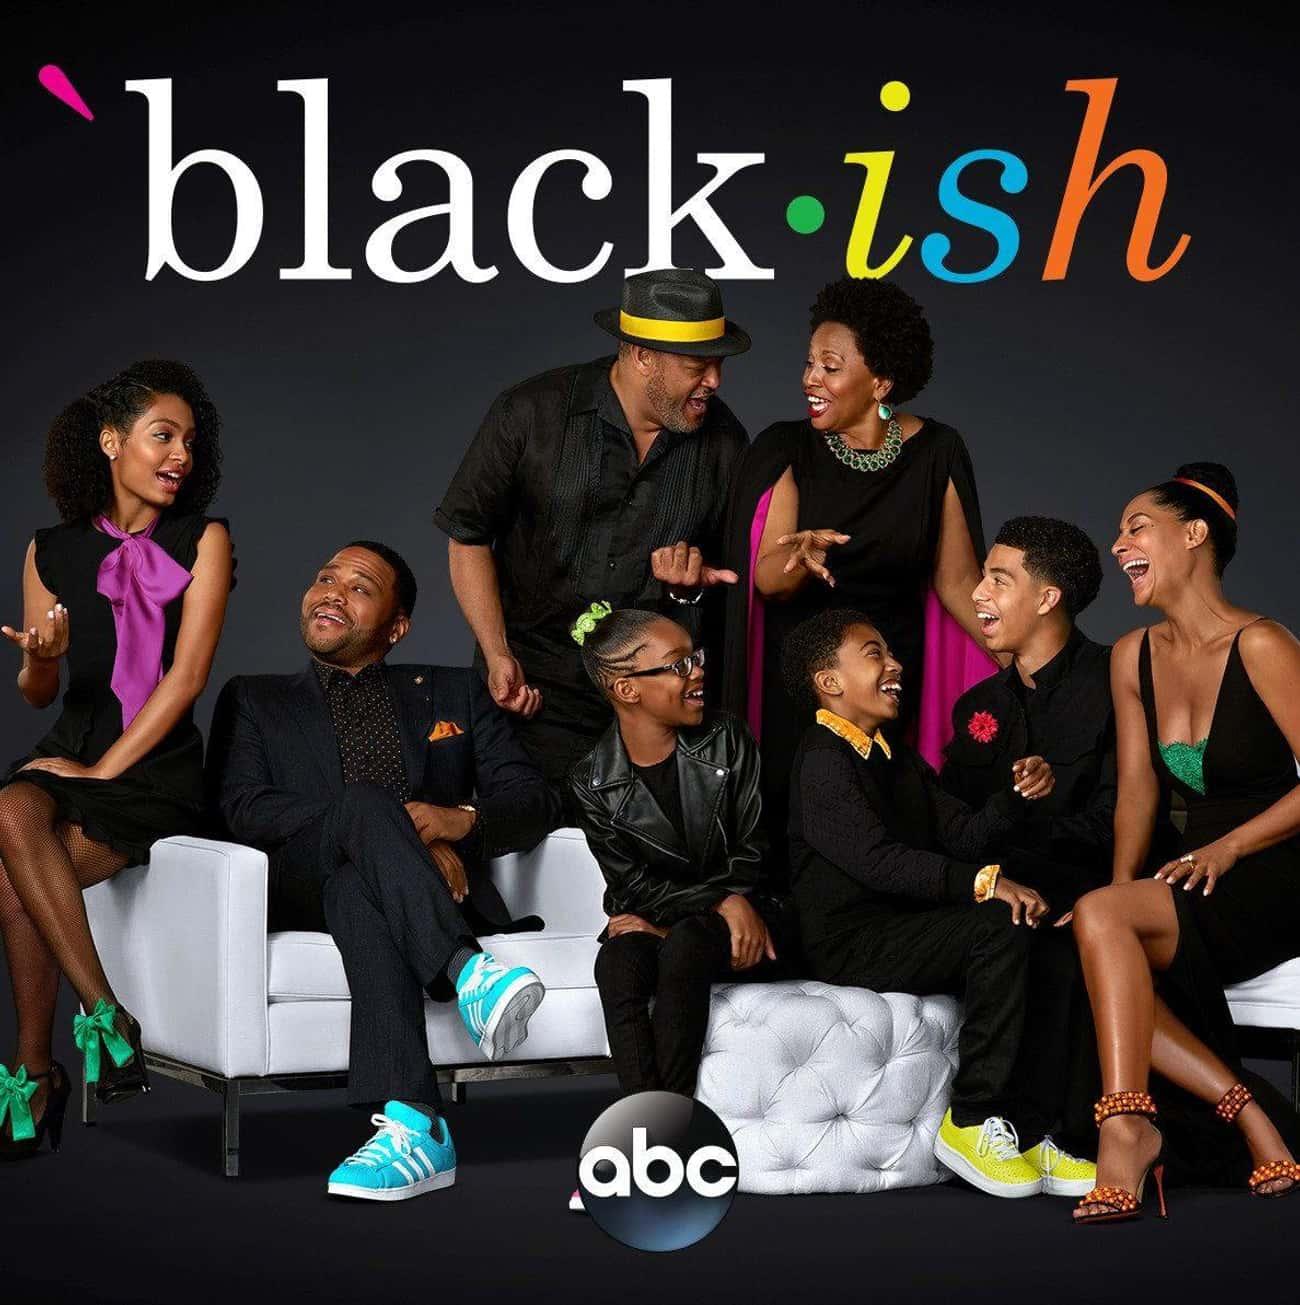 Blackish - Season 3 is listed (or ranked) 3 on the list Ranking the Best Seasons of 'Black-ish'